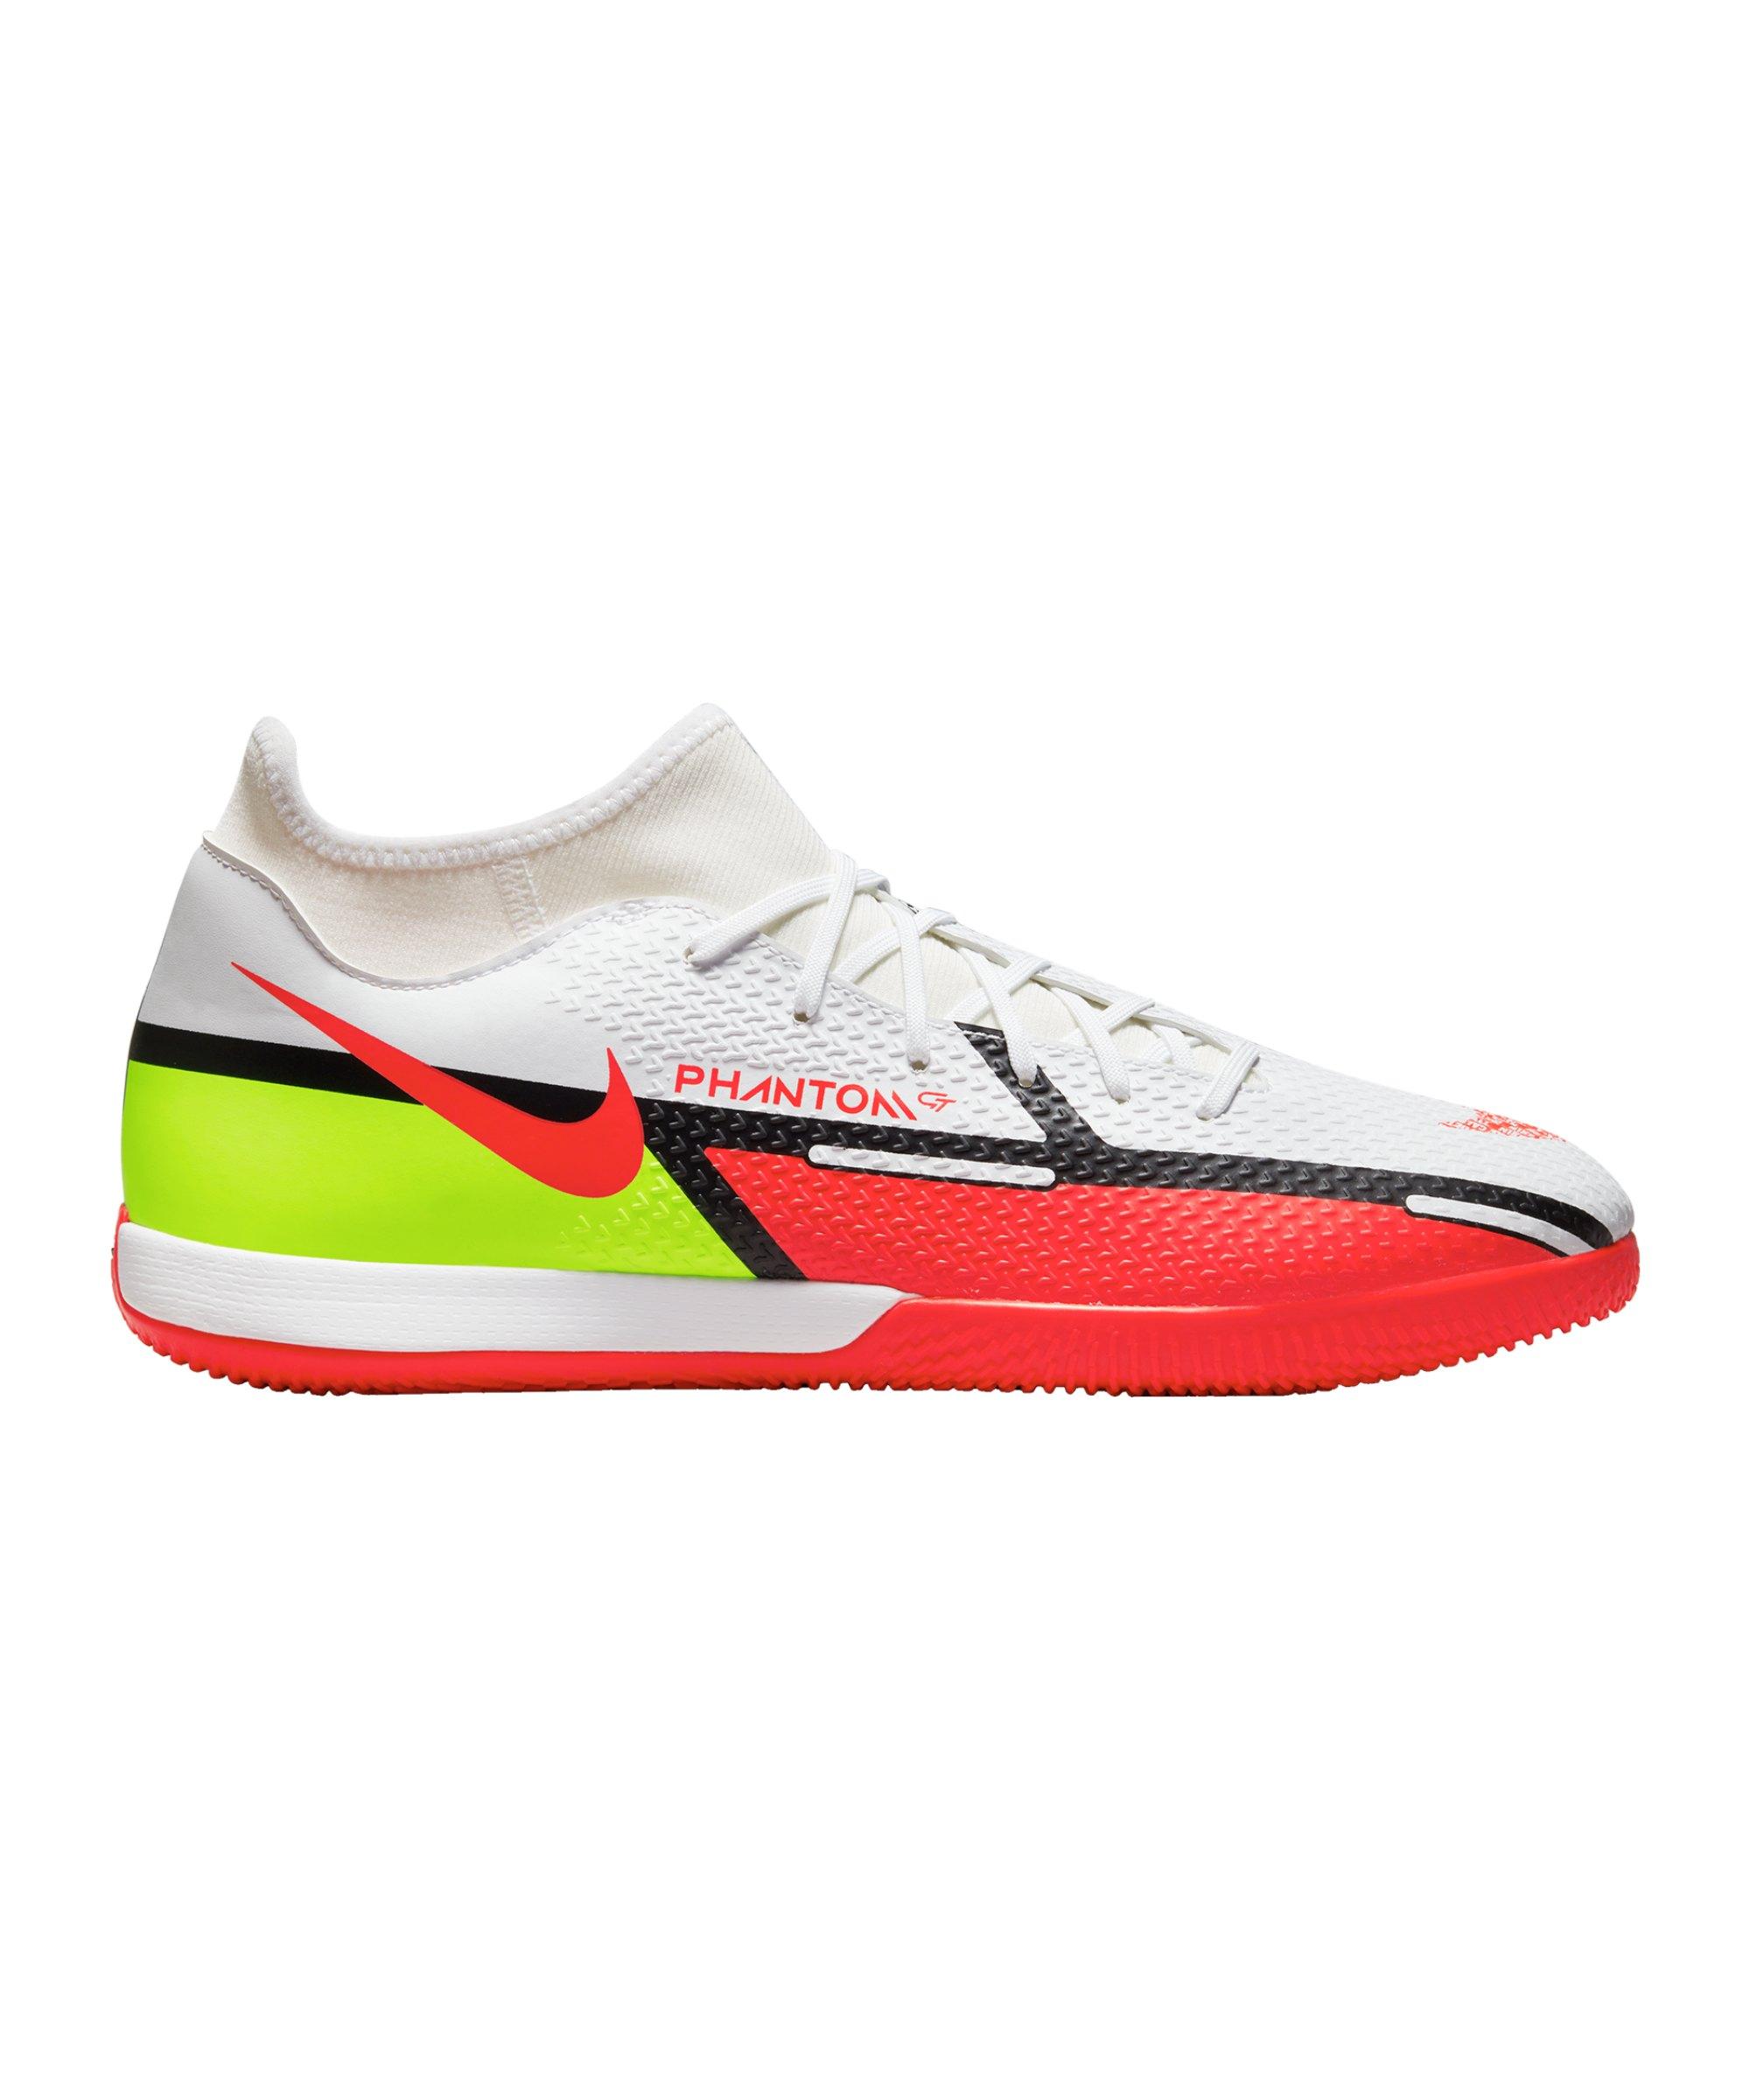 Nike Phantom GT2 Motivation Academy DF IC Halle Weiss F167 - weiss